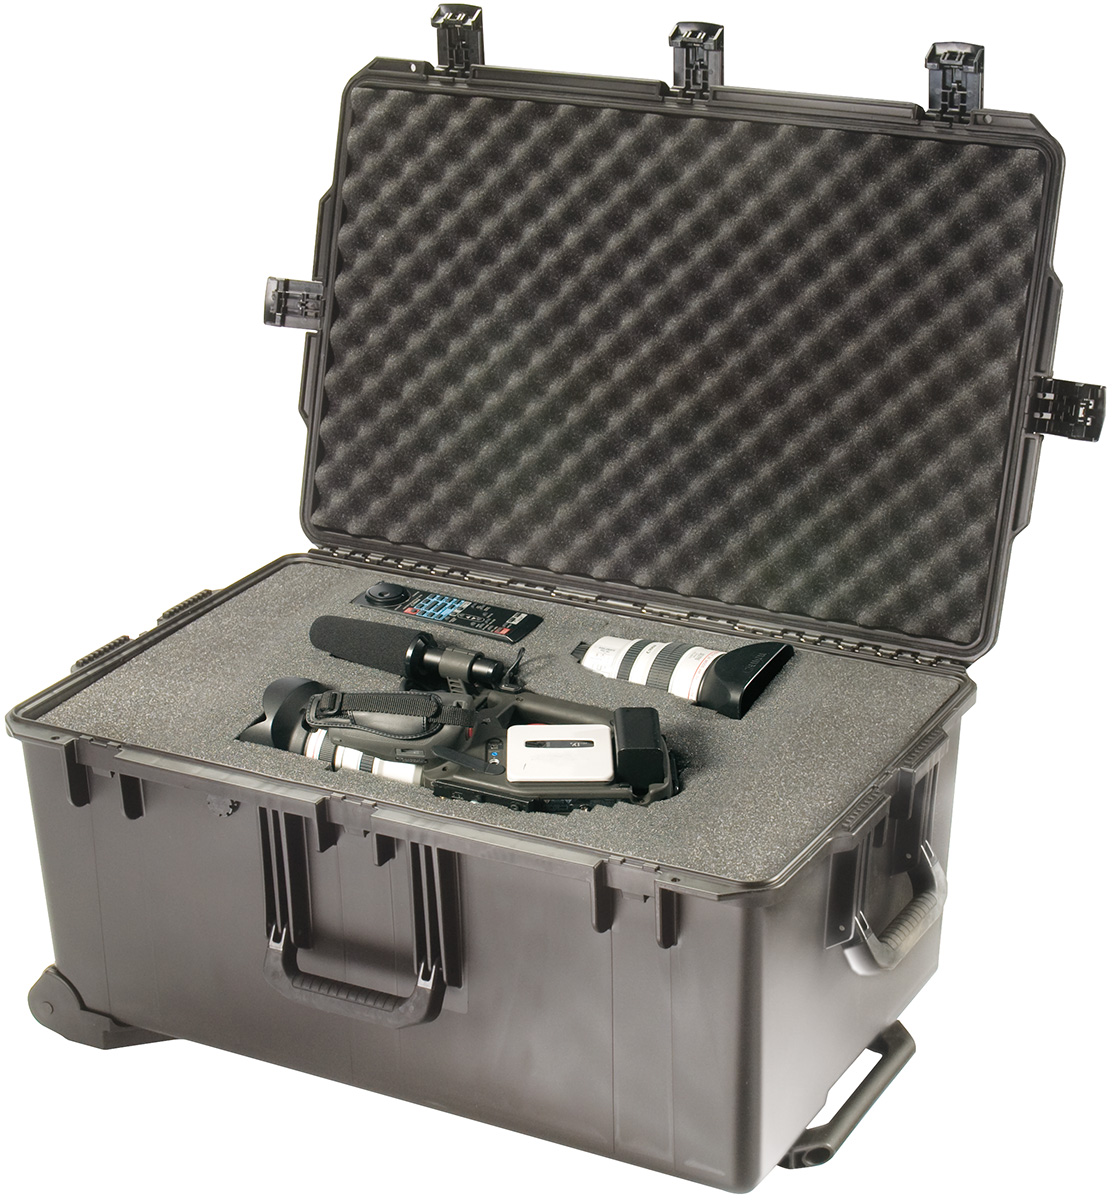 pelican peli products iM2975 storm video camera watertight case